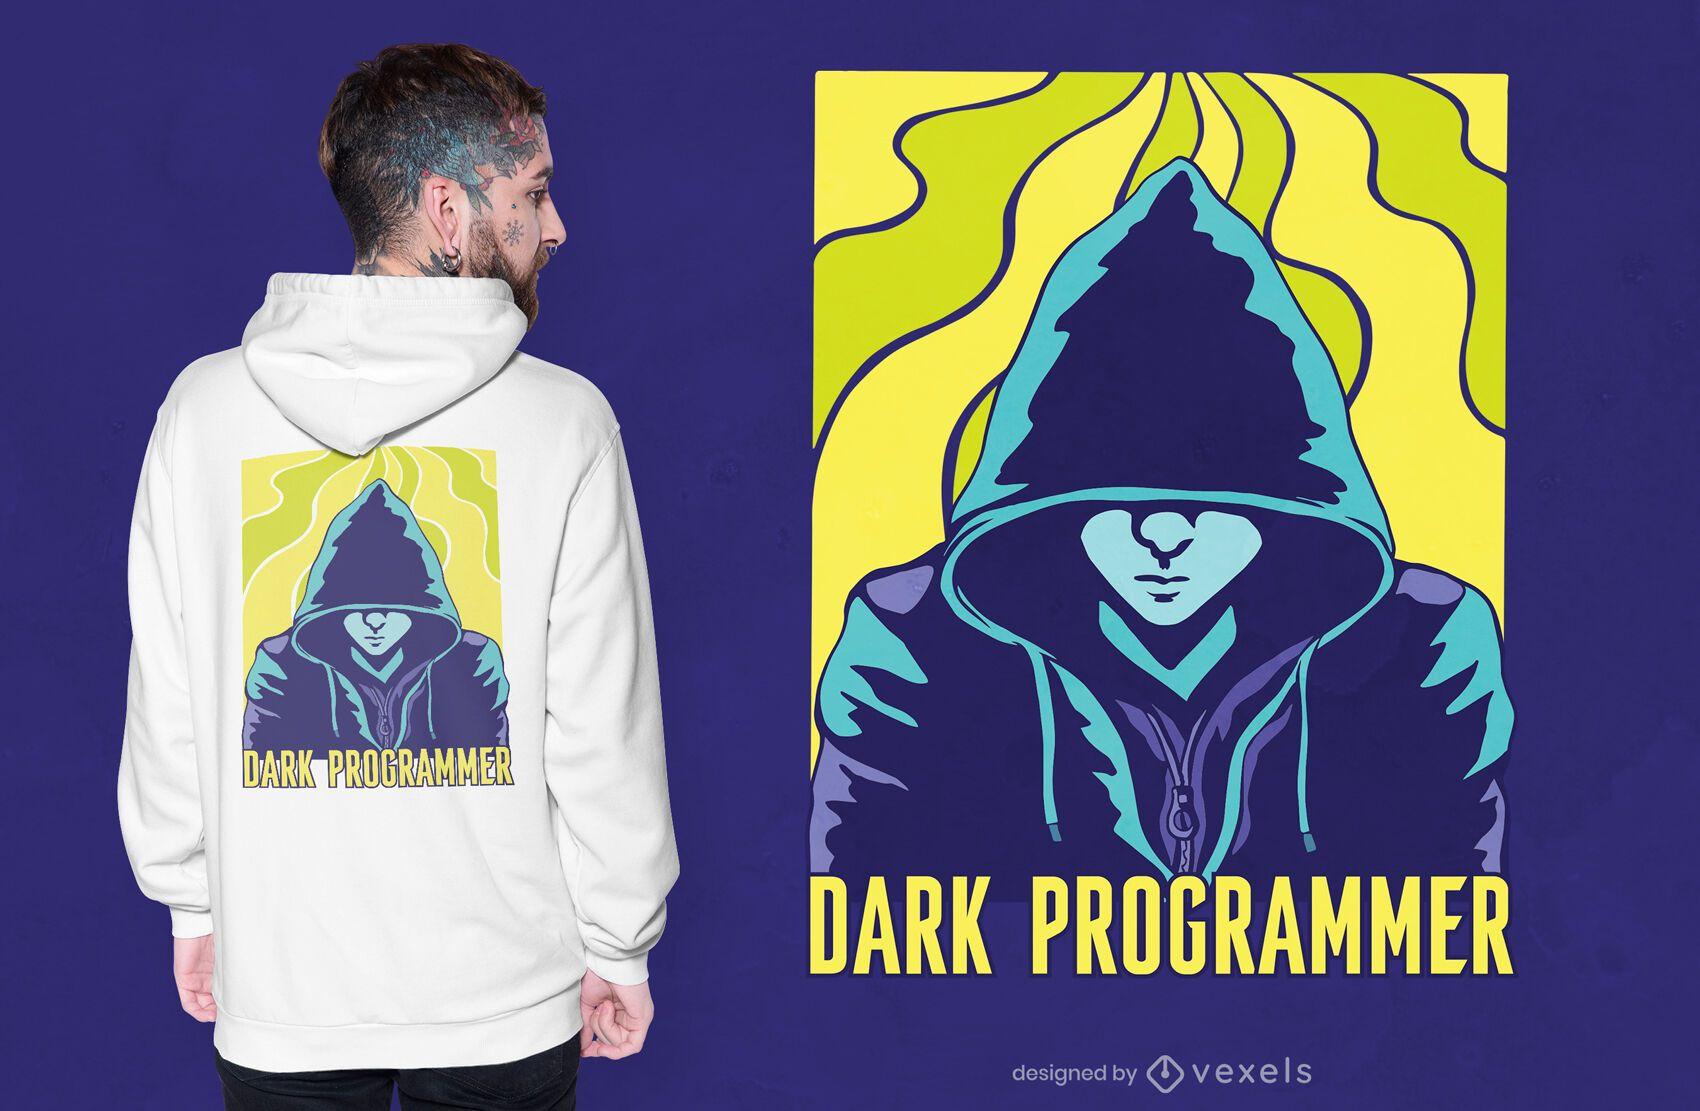 Dark programmer t-shirt design